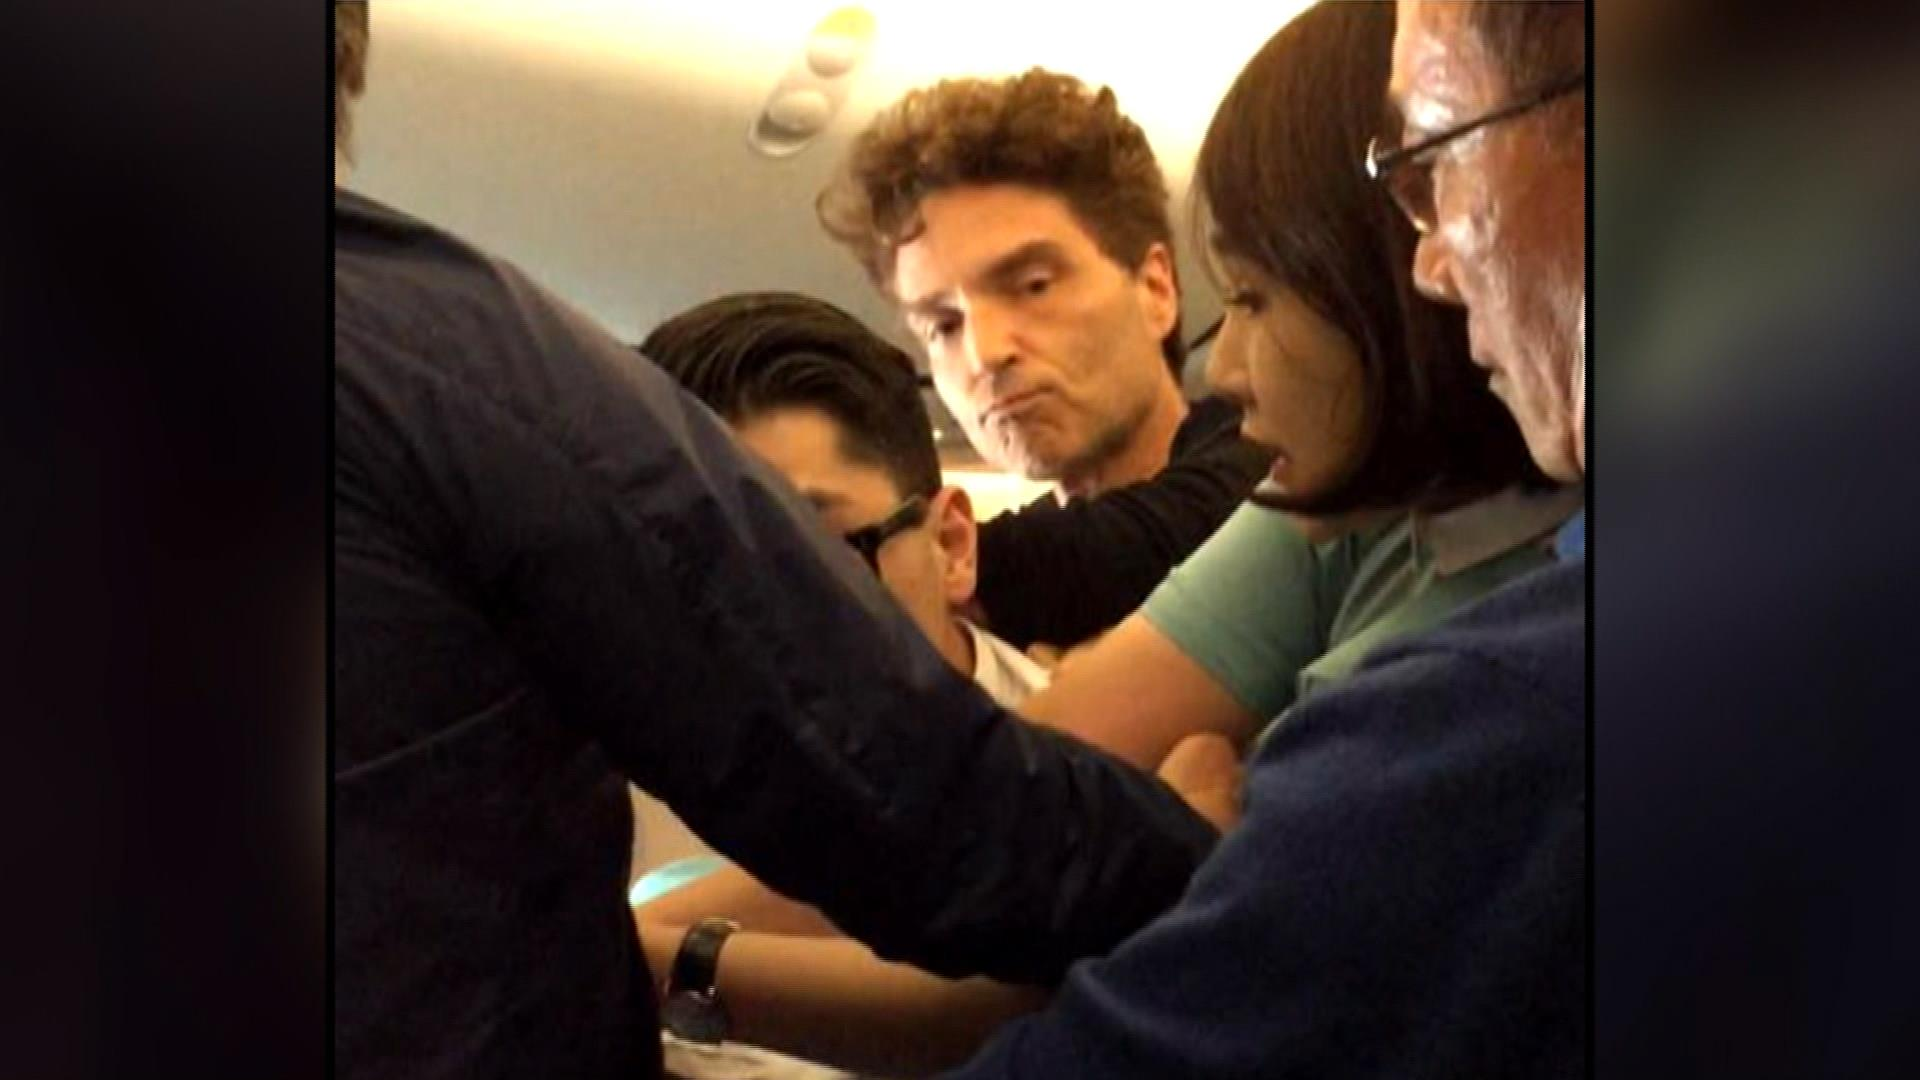 singer richard marx help restrain man on plane wife daisy fuentes